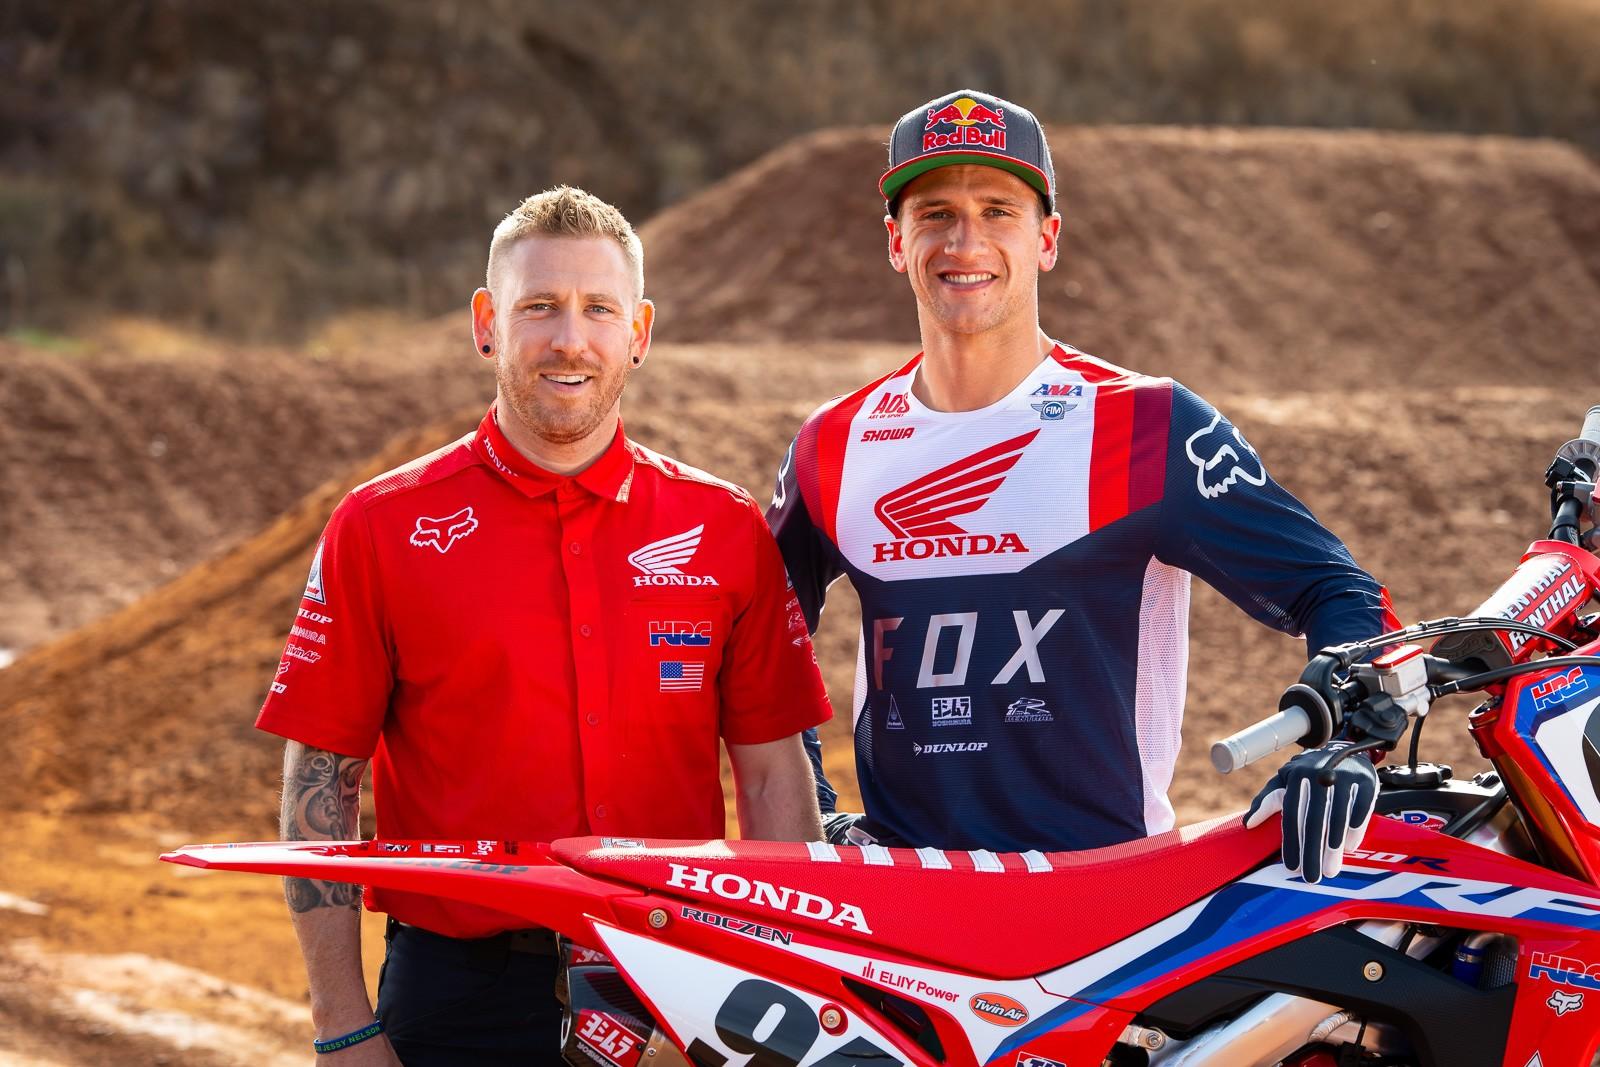 Jordan Troxell and Ken Roczen - Team Honda HRC 2020 - Motocross Pictures - Vital MX